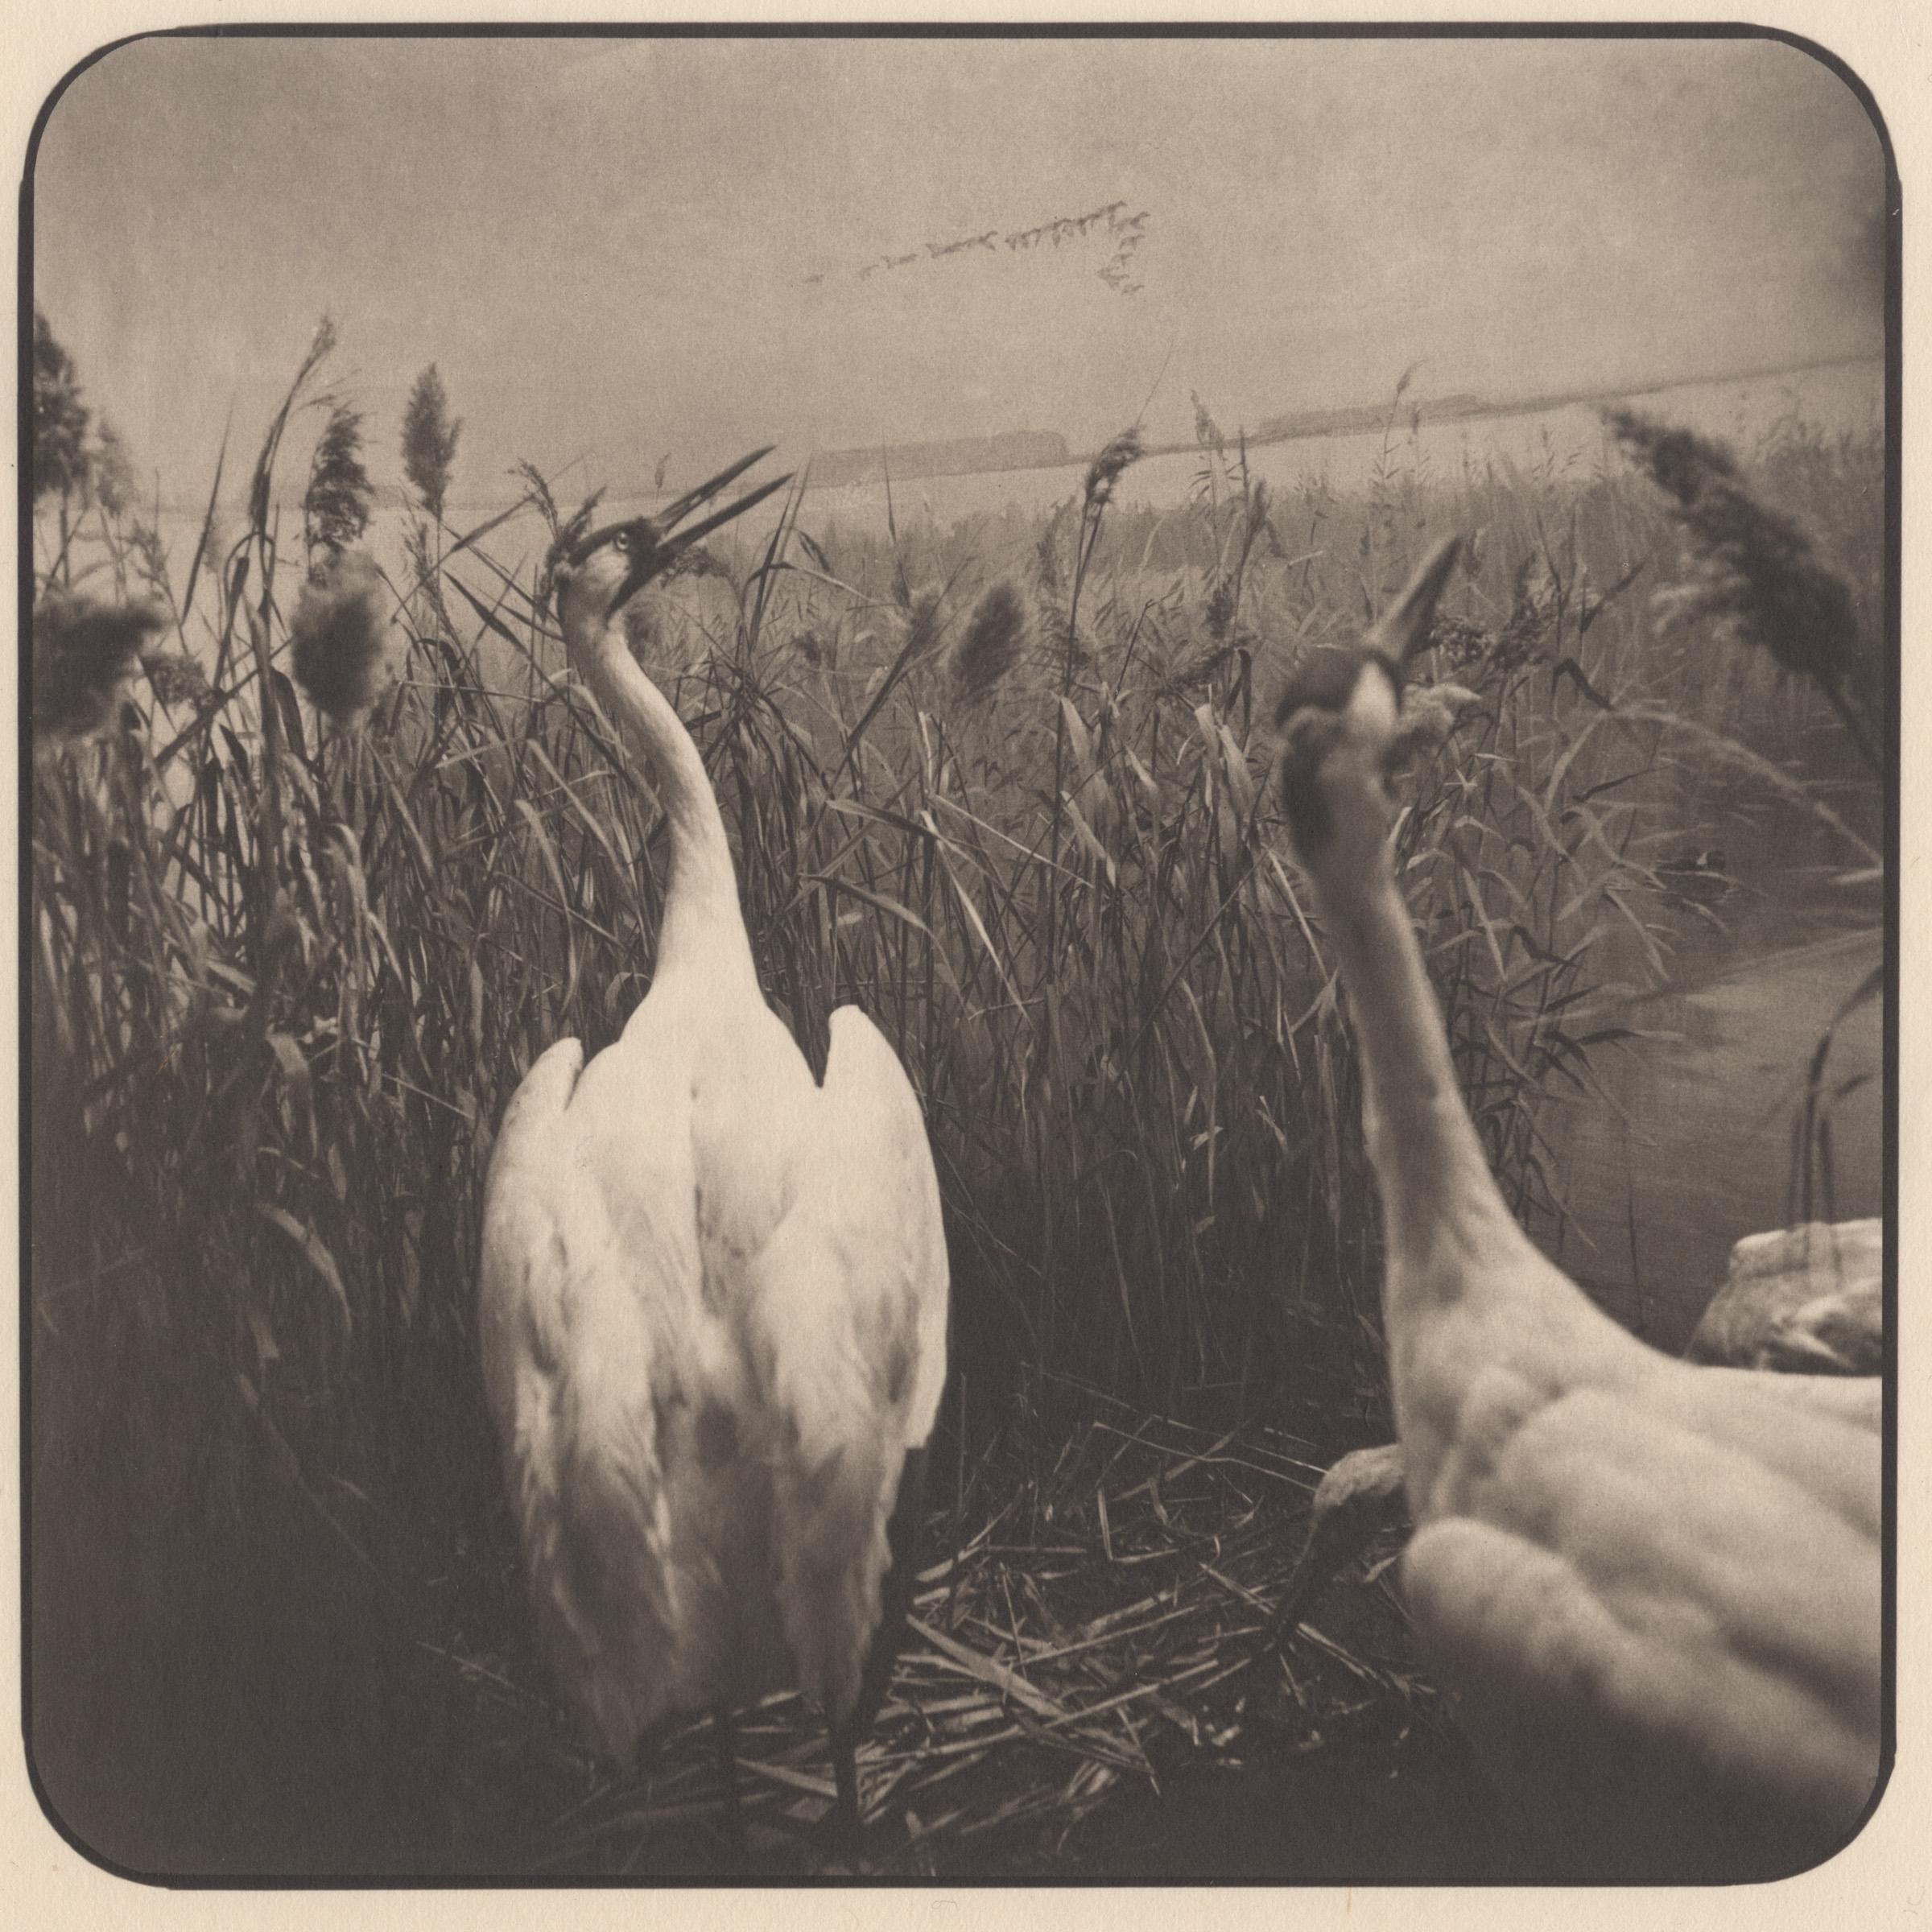 Takeshi SHIKAMA, Garden of Memory, Animals #17, 2012/2015, Tirage platine/palladium sur papier Gampi. Signé et numéroté par l'artiste au crayon. Edition de 12, 19,4 x 19,4 cm © Takeshi Shikama